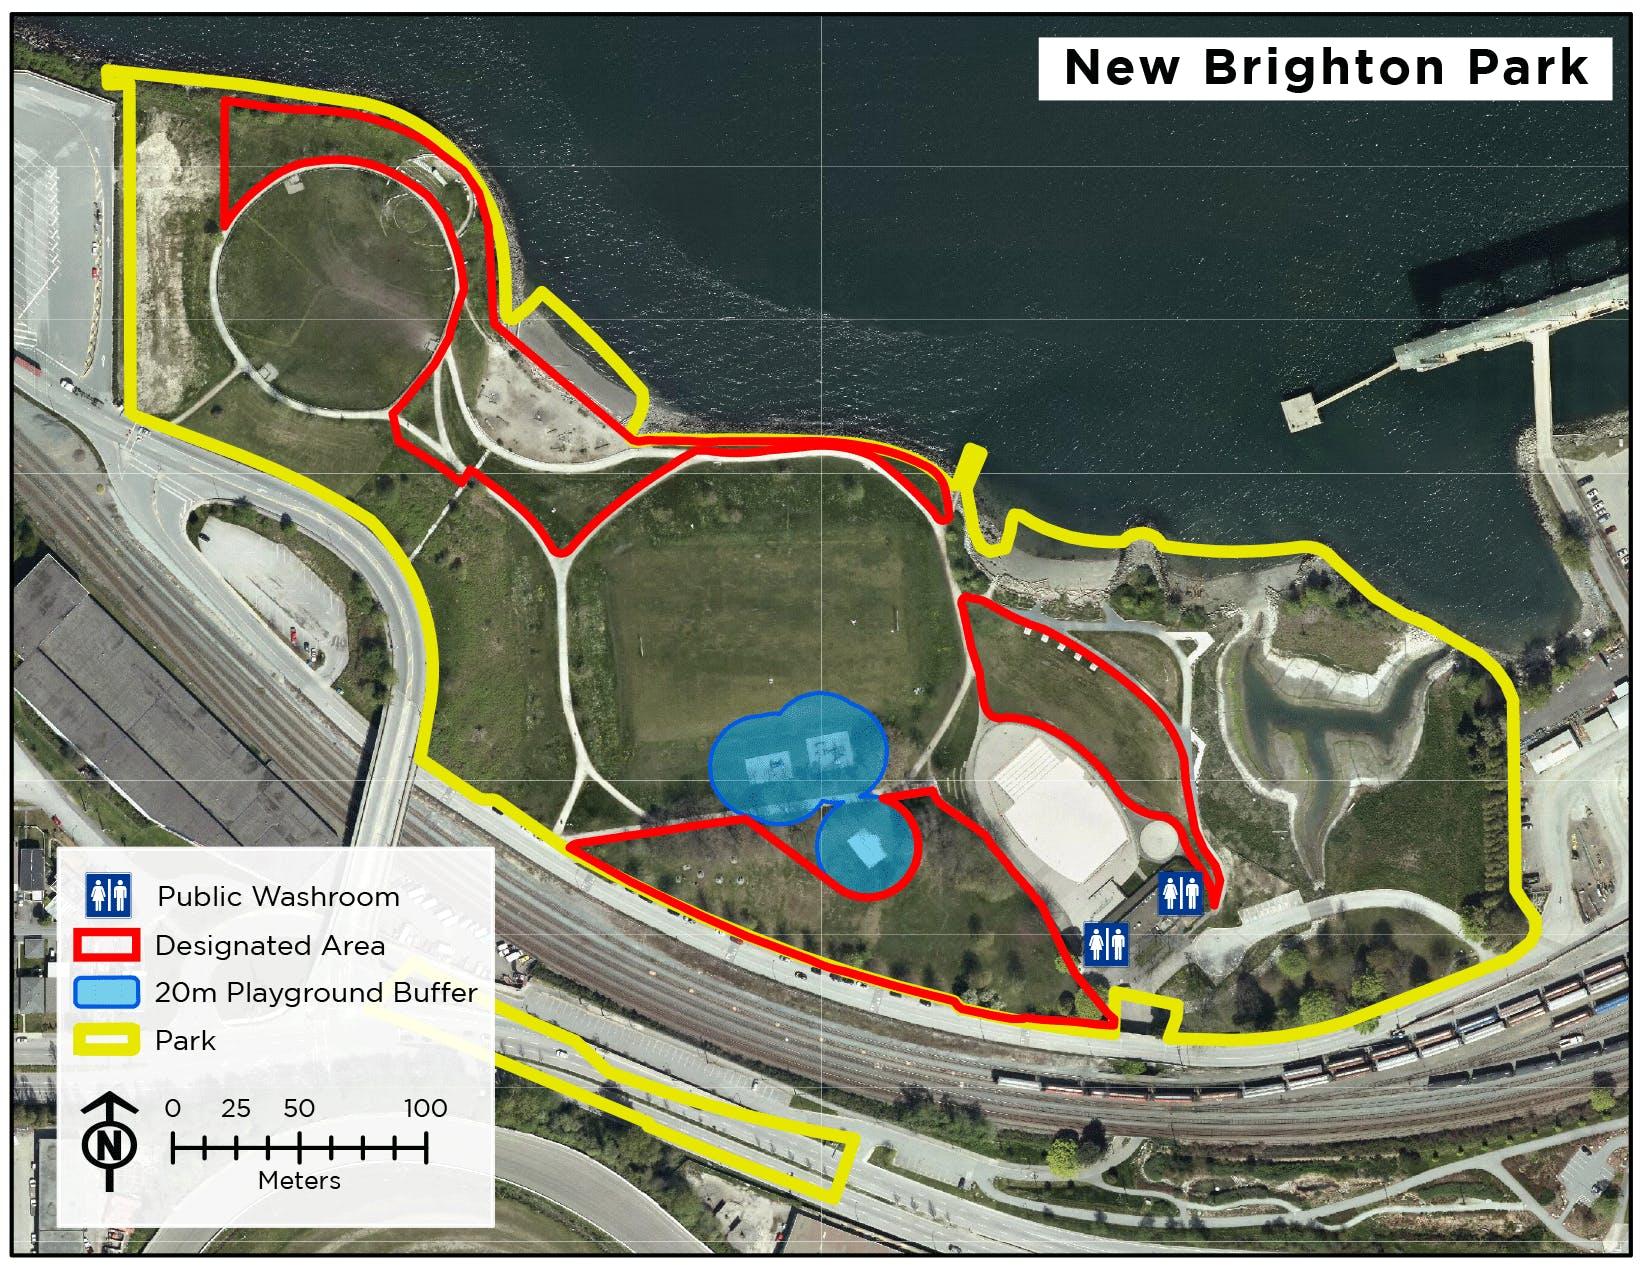 New Brighton Park